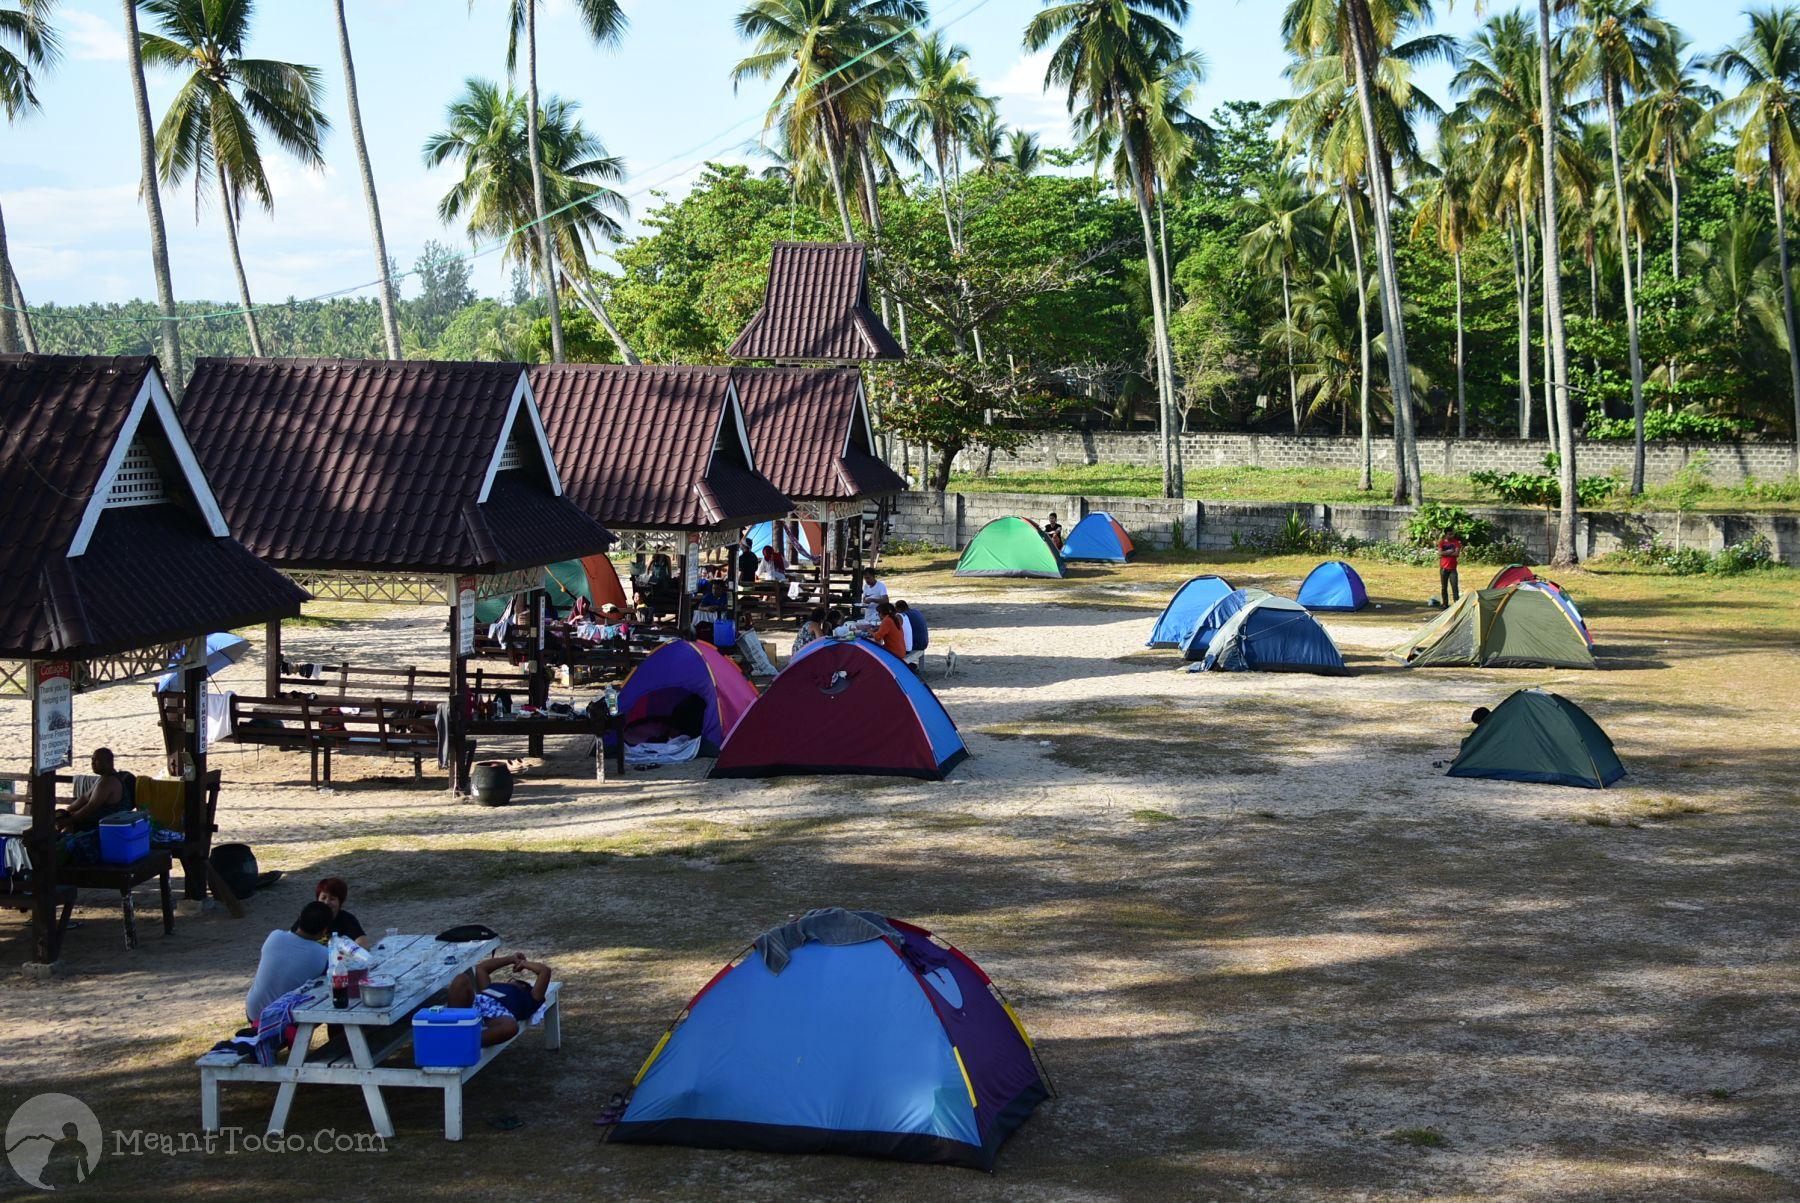 Menzi Beach Park & Campsite, Dahican, Davao Oriental